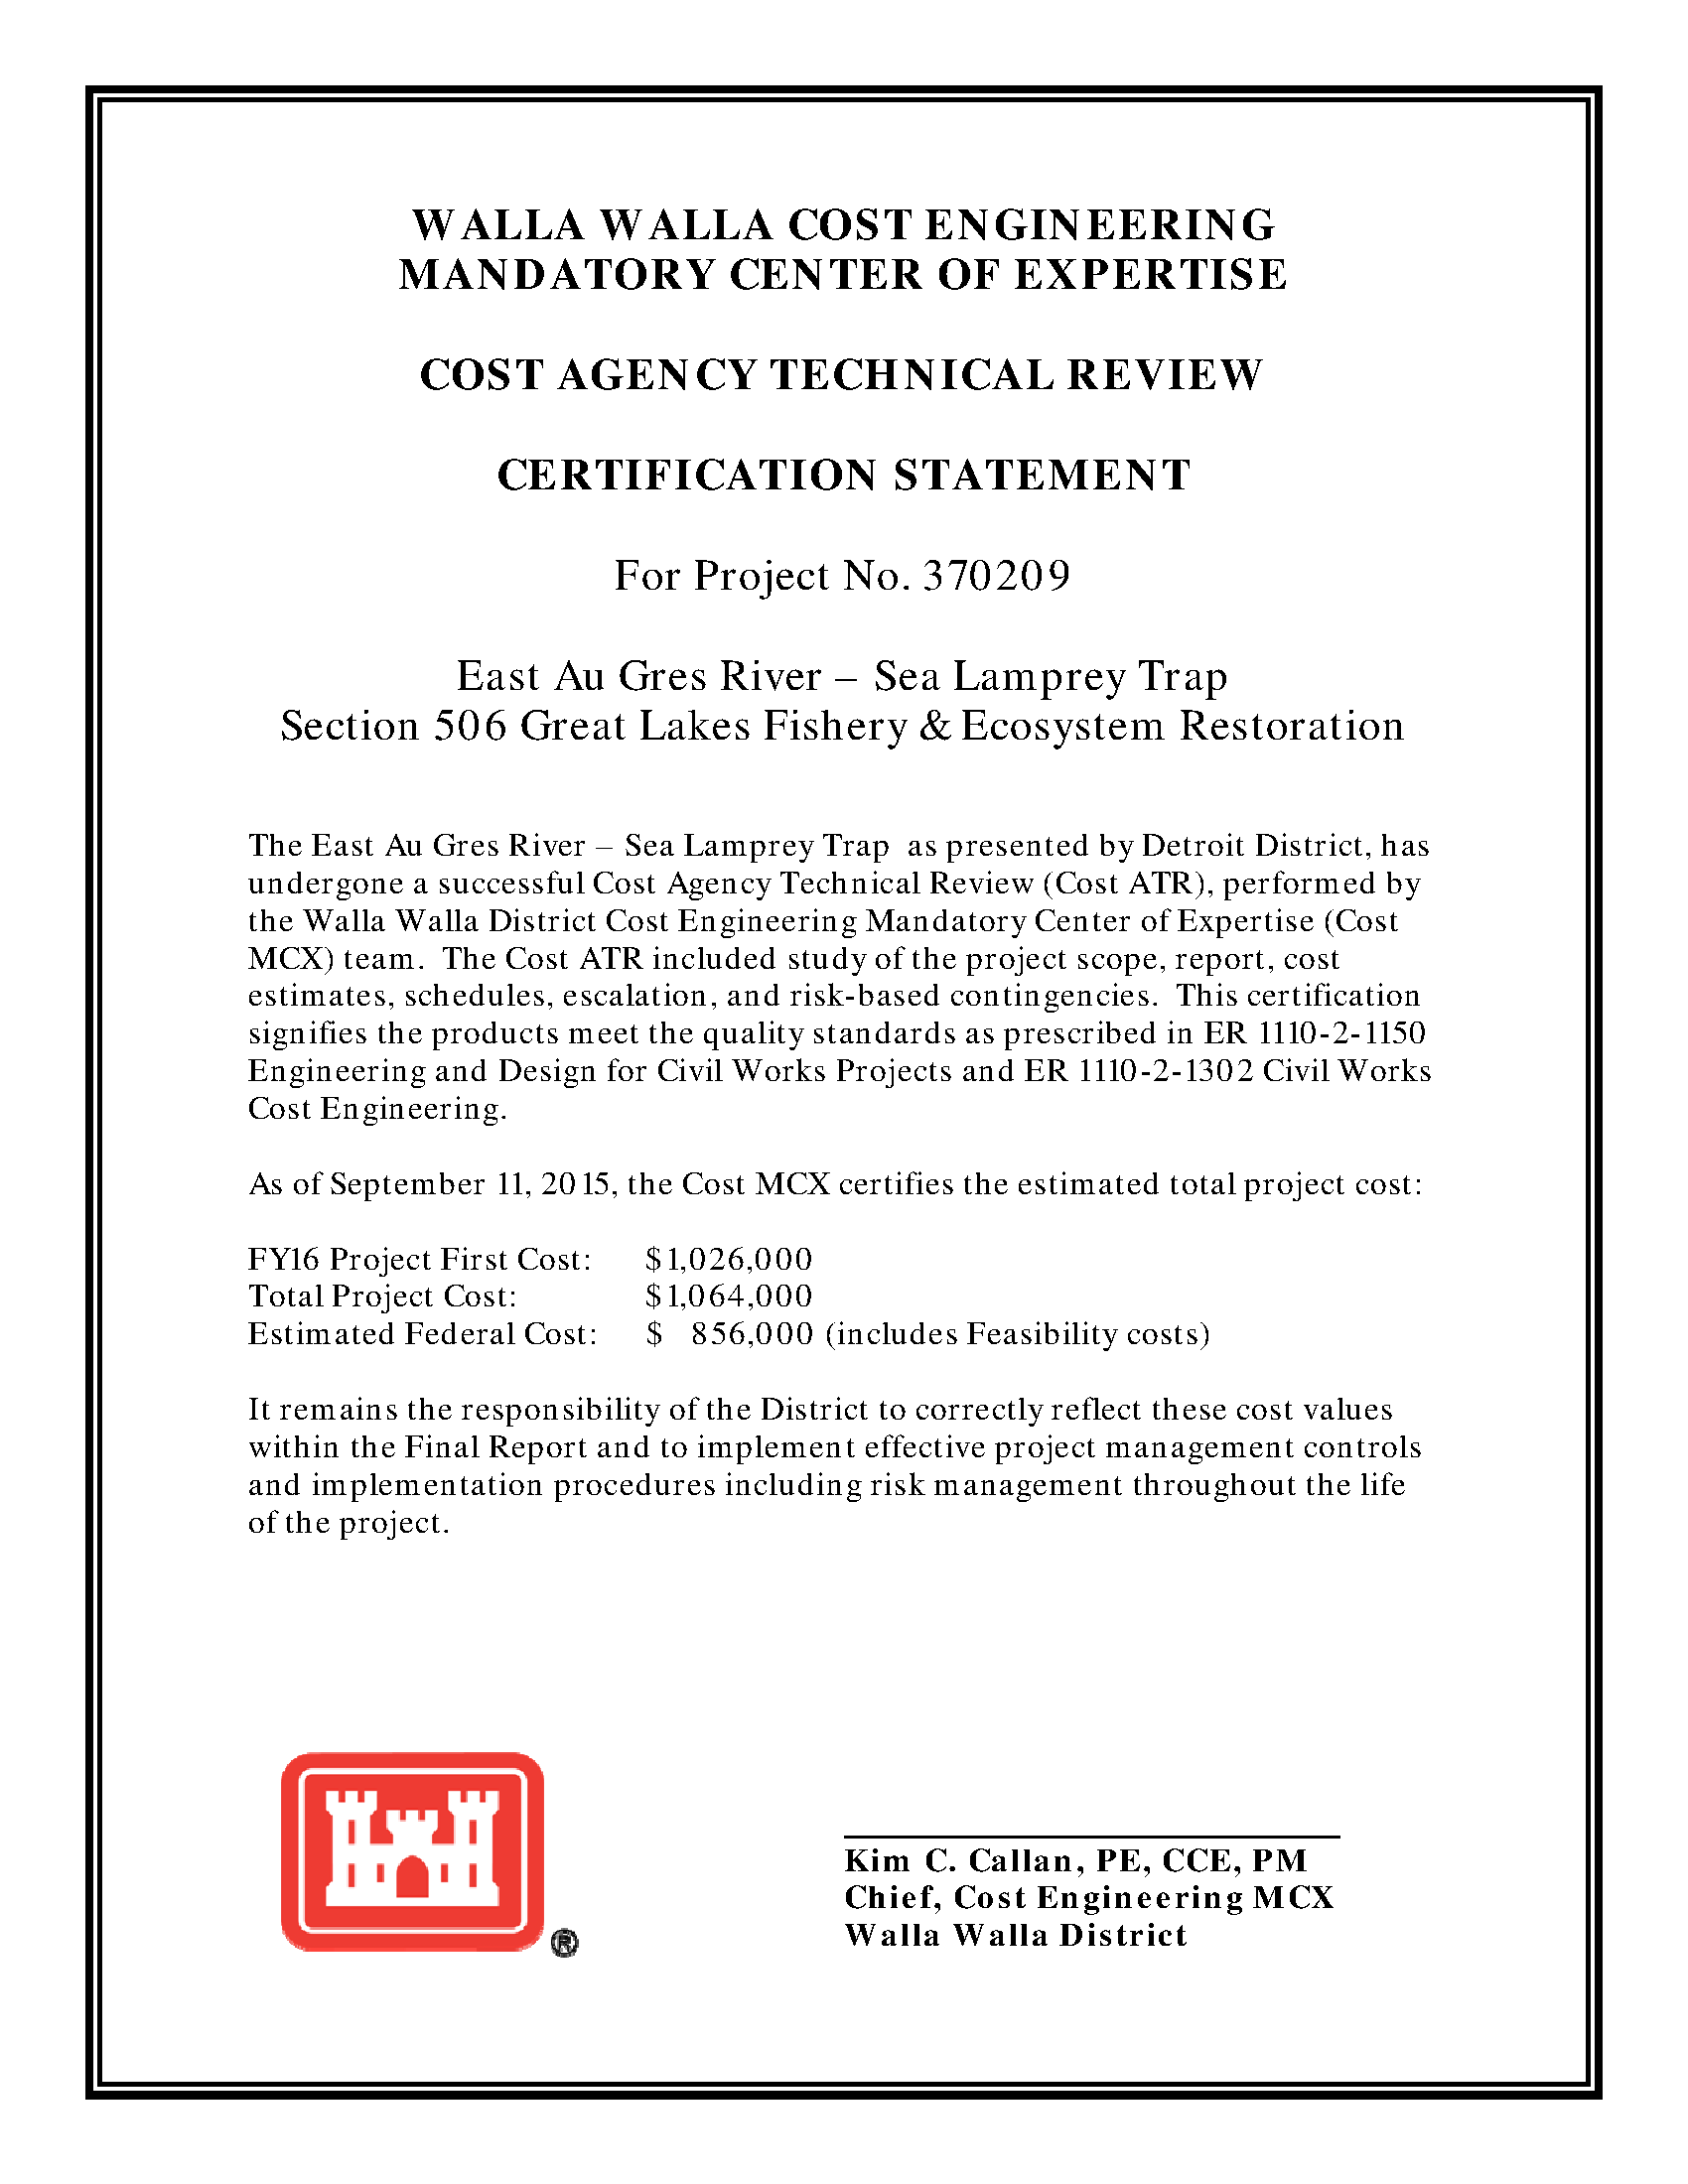 Appendix B Cost Appendix For Detailed Project Report For E Au Gres